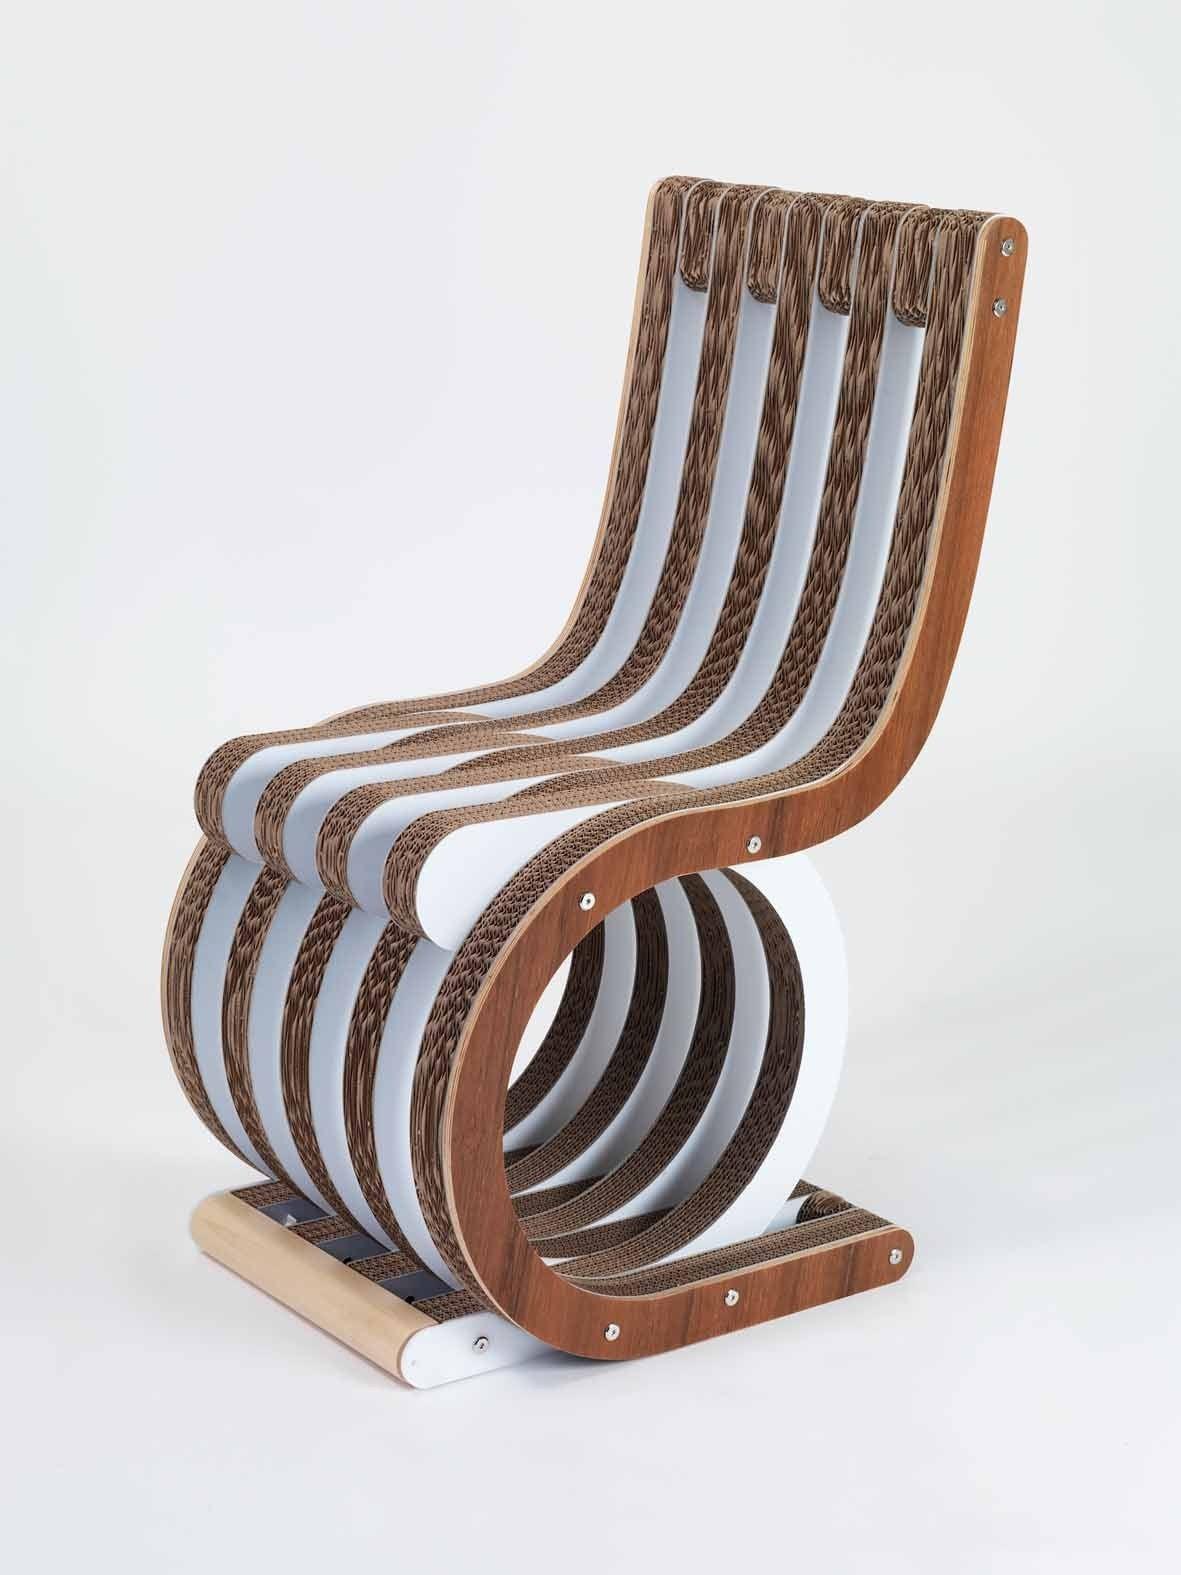 Cardboard rocking chair - Cardboard Chair